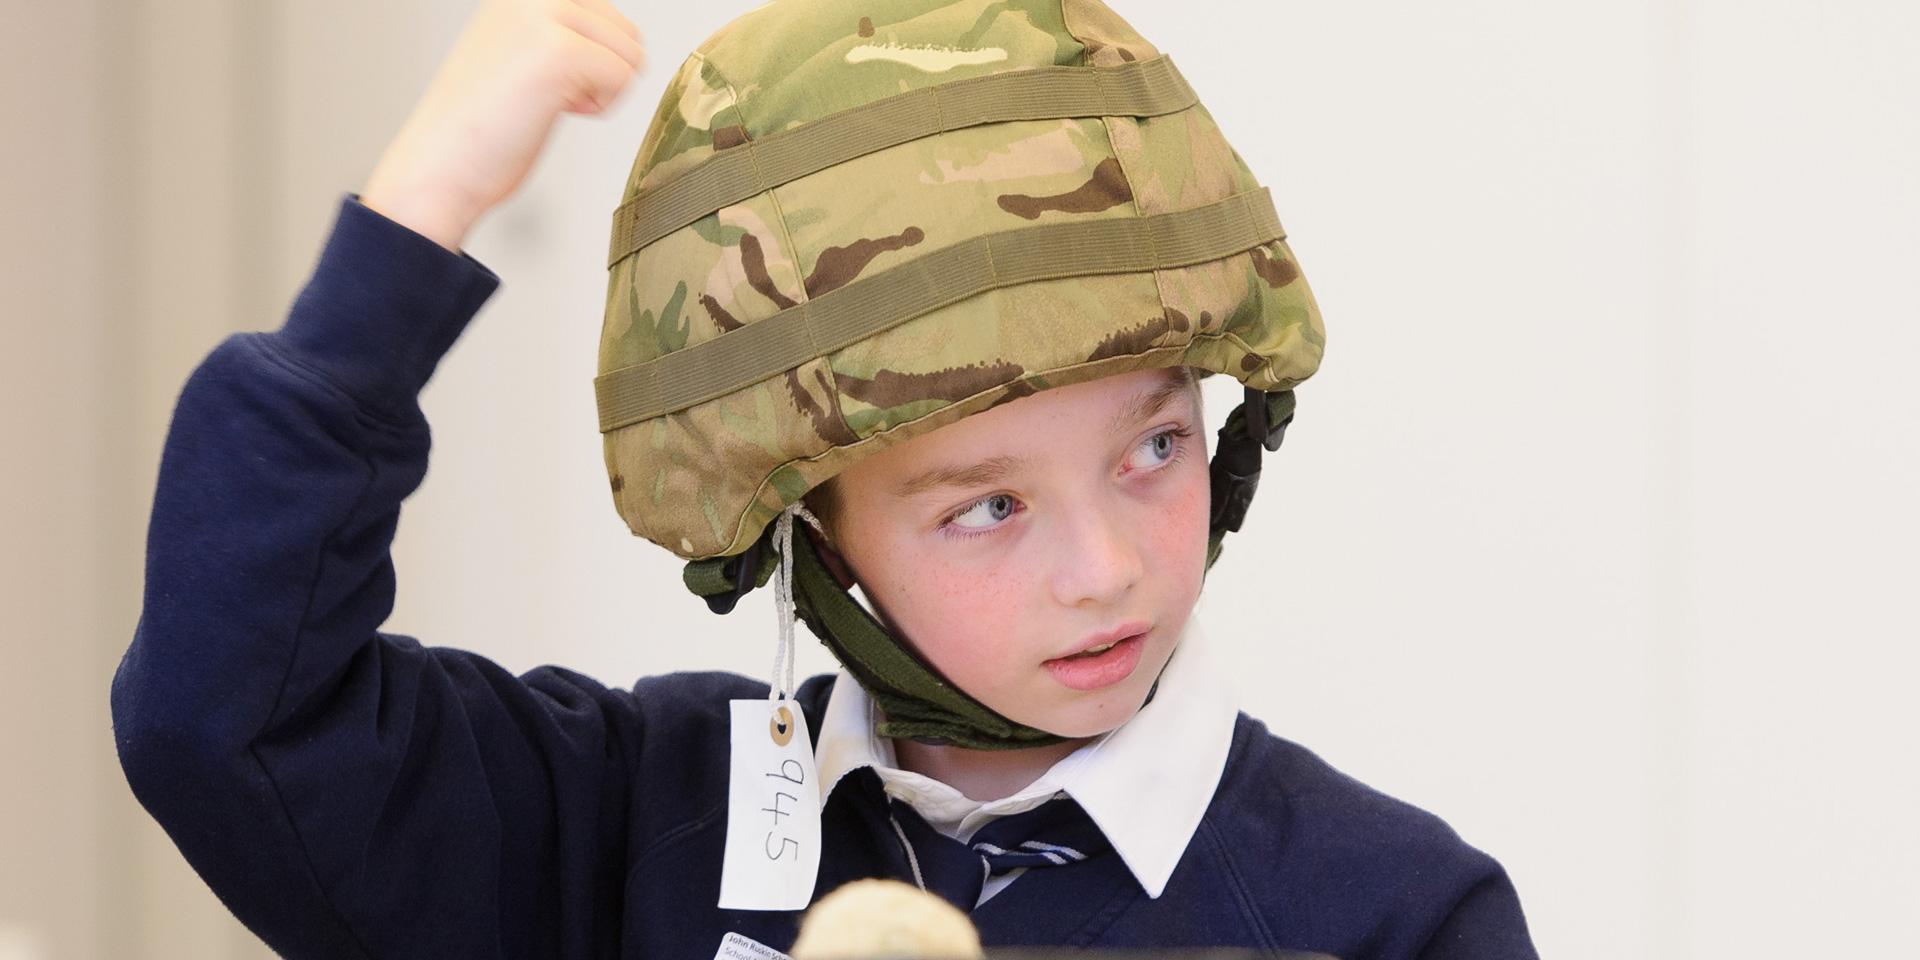 School boy trying on a helmet